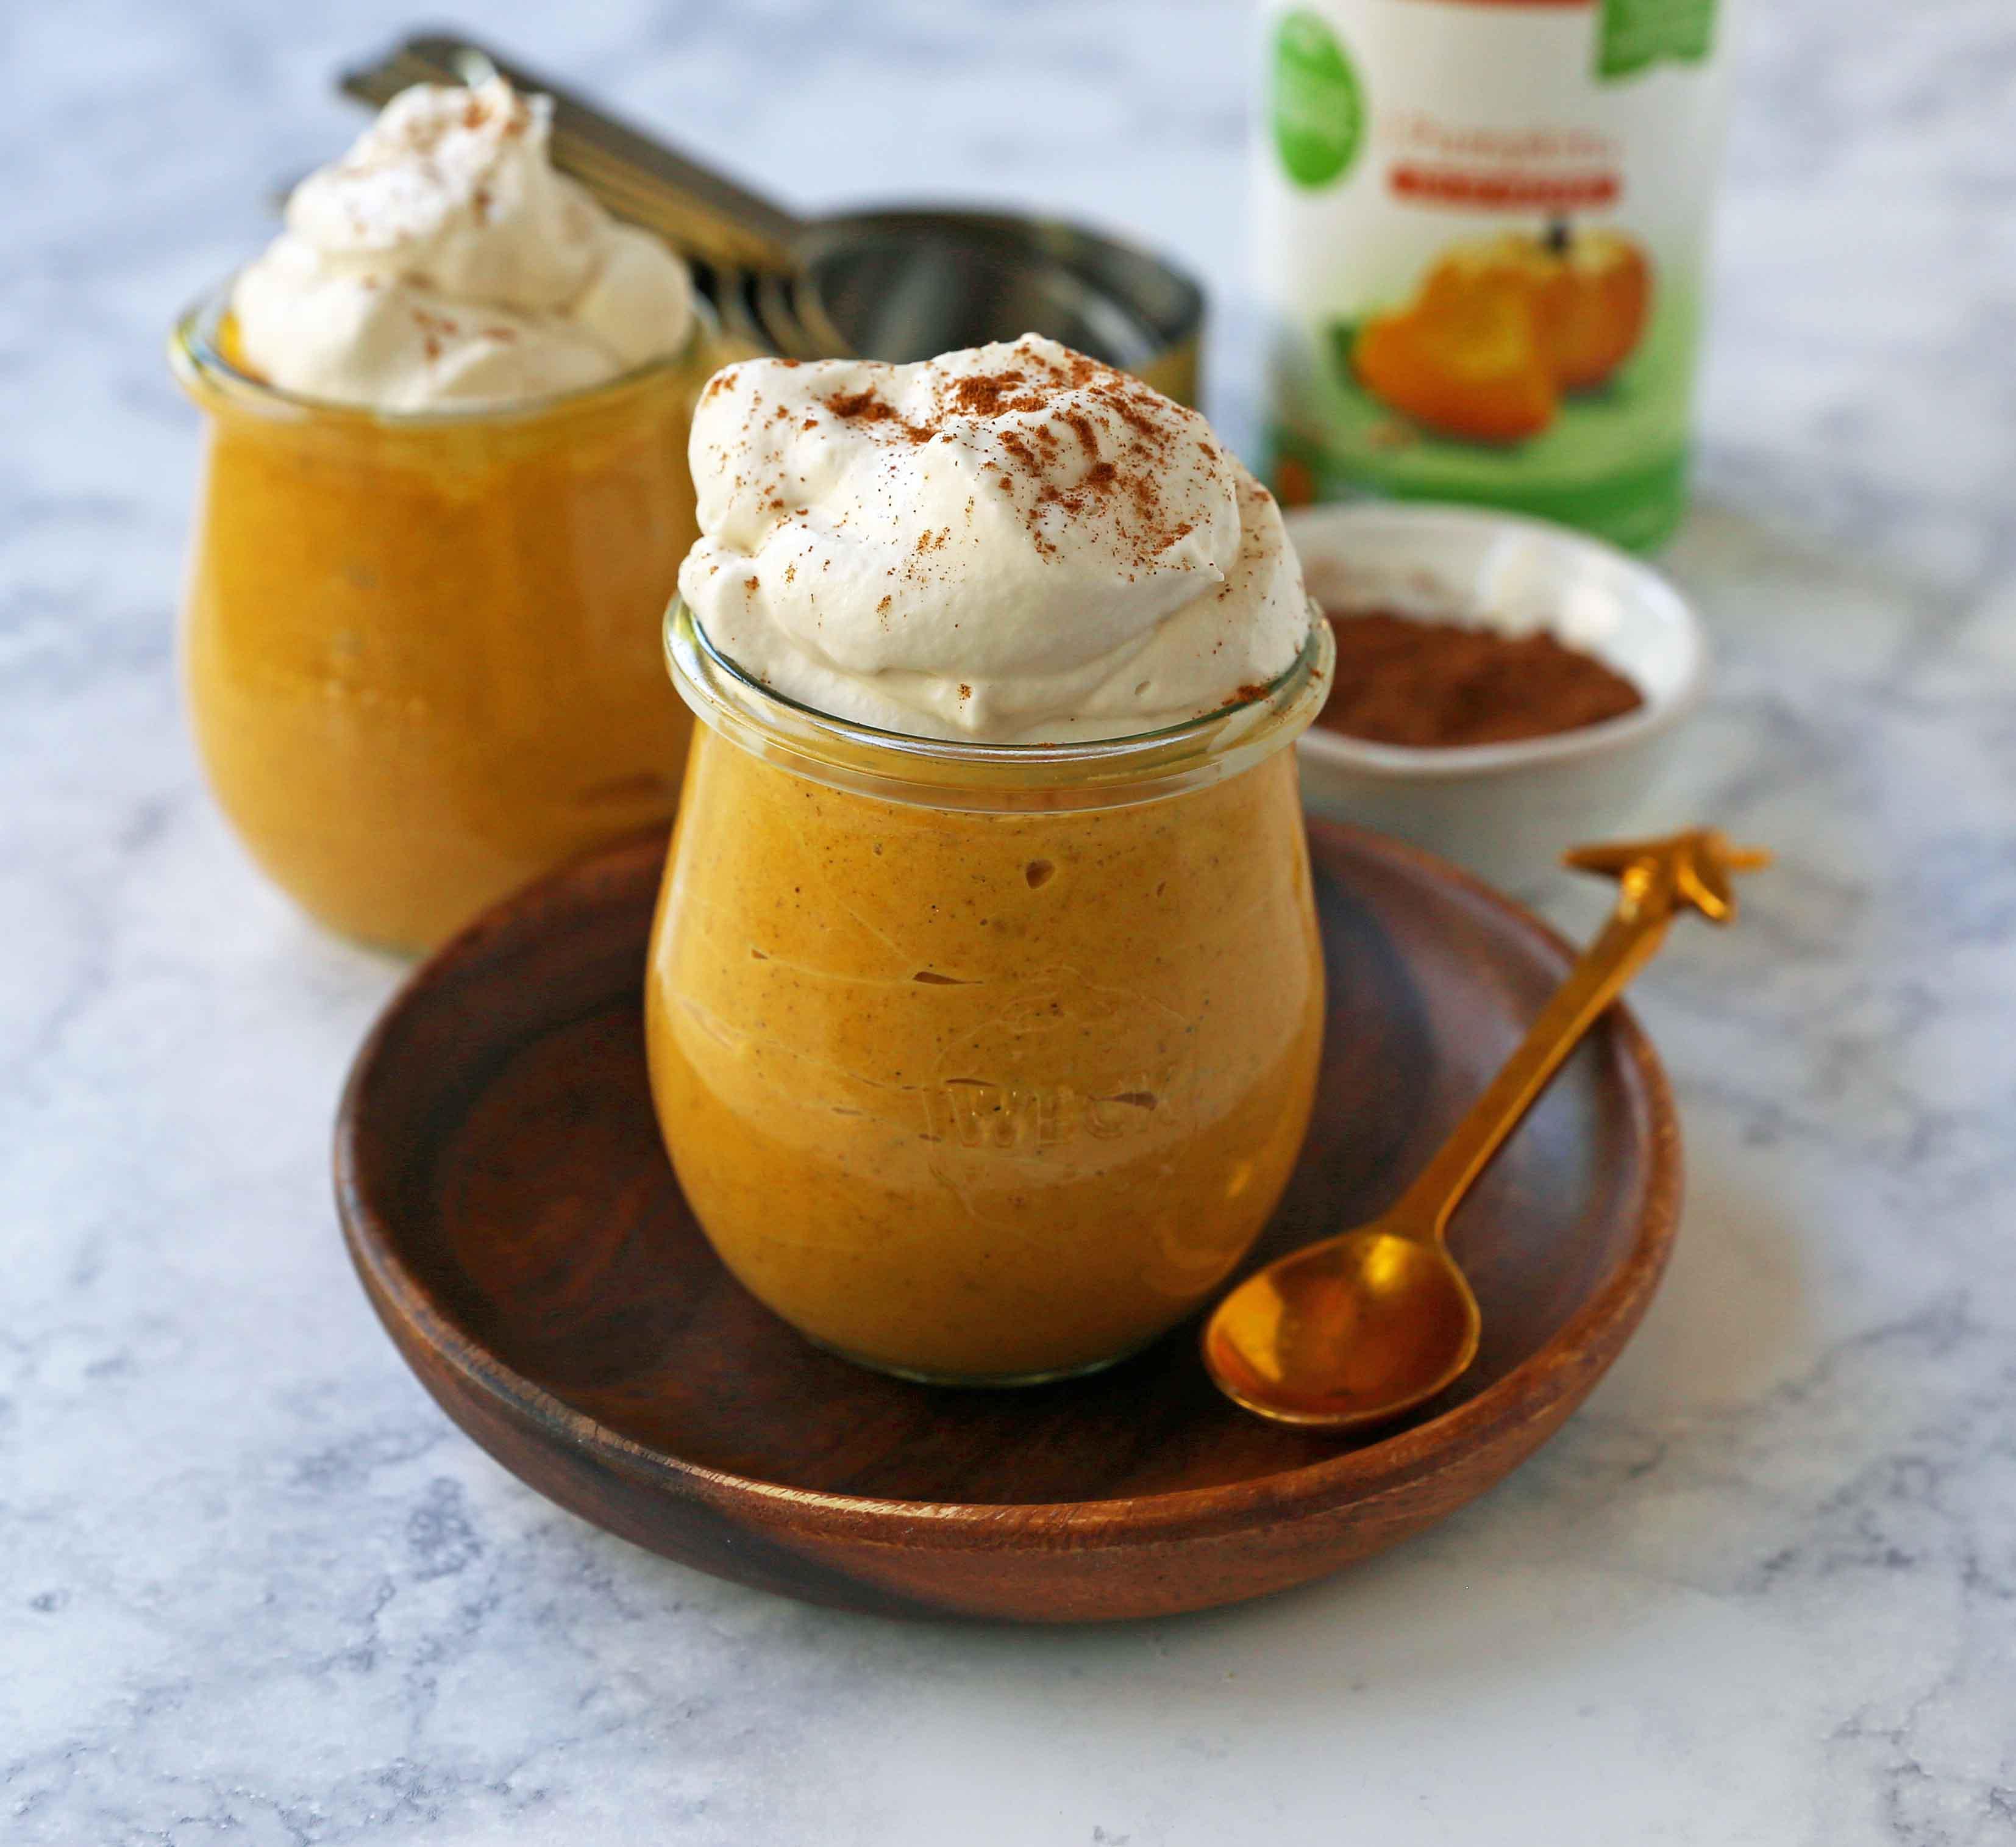 Pumpkin Cheesecake Mousse. This no-sugar-added creamy pumpkin cheesecake mousse is the perfect no-bake pumpkin dessert. Low-carb pumpkin dessert options. www.modernhoney.com #pumpkin #pumpkinmousse #pumpkindessert #ketofriendly #ketodessert